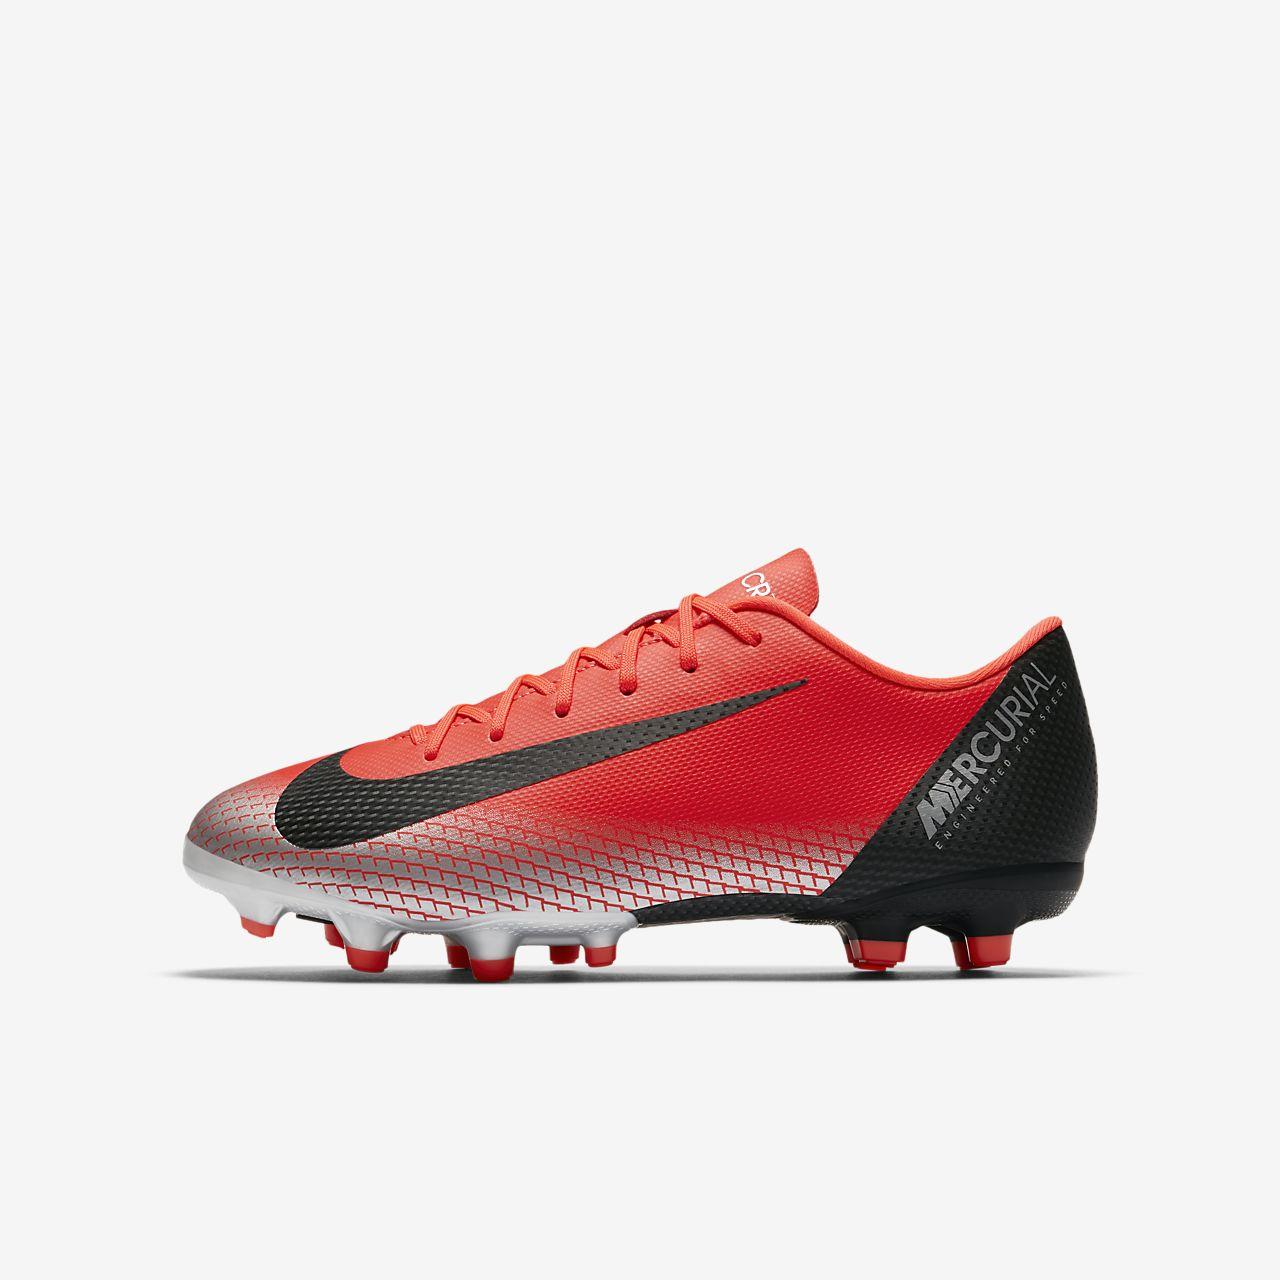 size 40 29a5f b6150 ... Nike Jr. Mercurial Vapor XII Academy CR7 MG Botas de fútbol para  múltiples superficies -